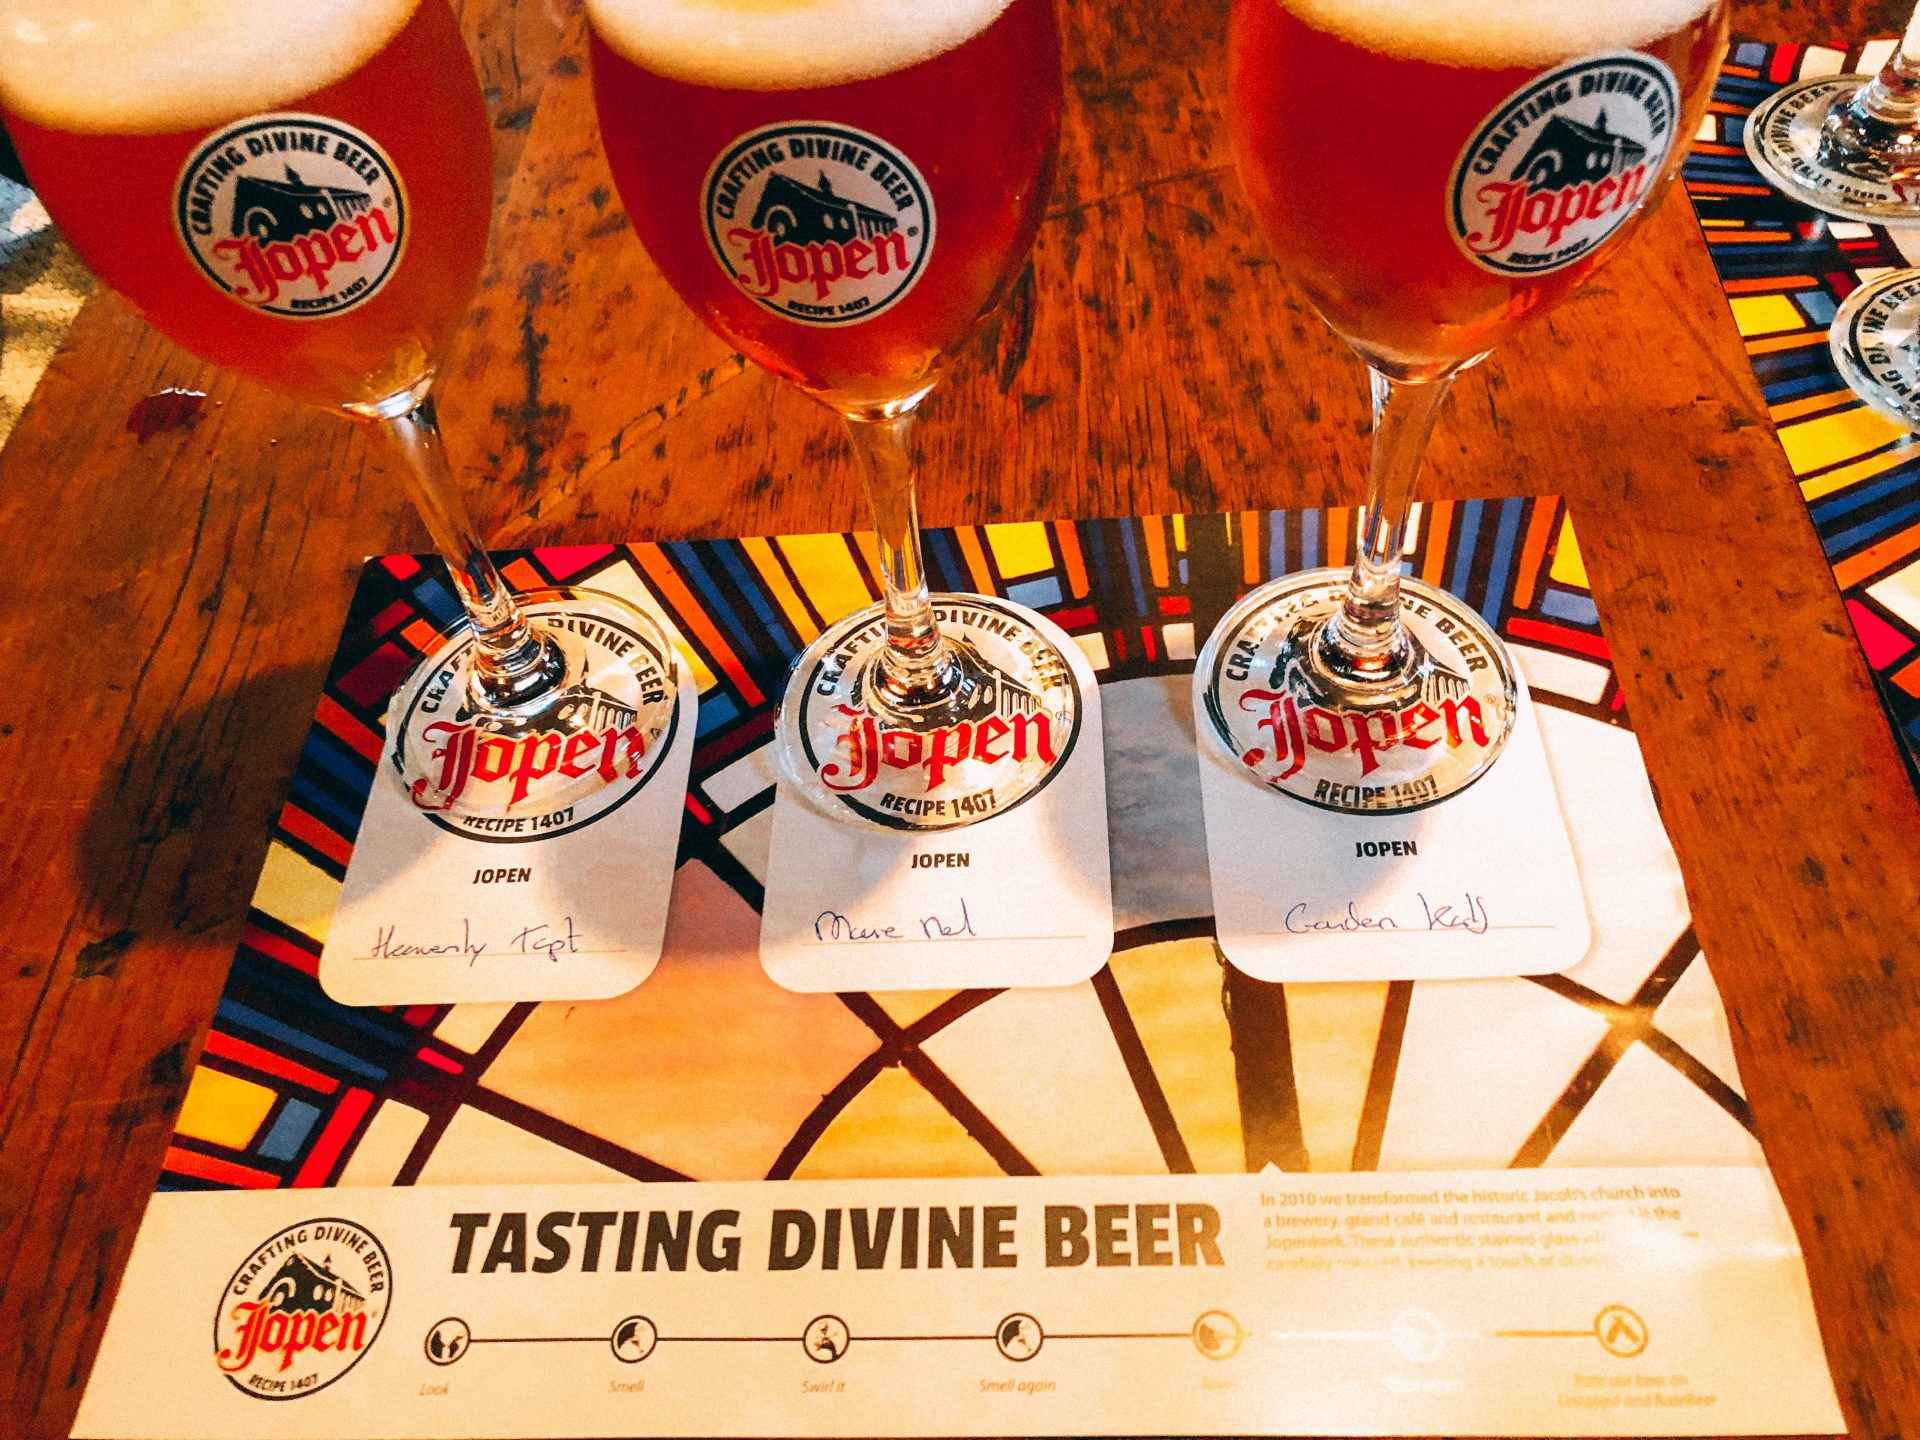 European Beer Travel Jopen Tasting Divine Beer three glasses of golden beer sitting on a card describing them.